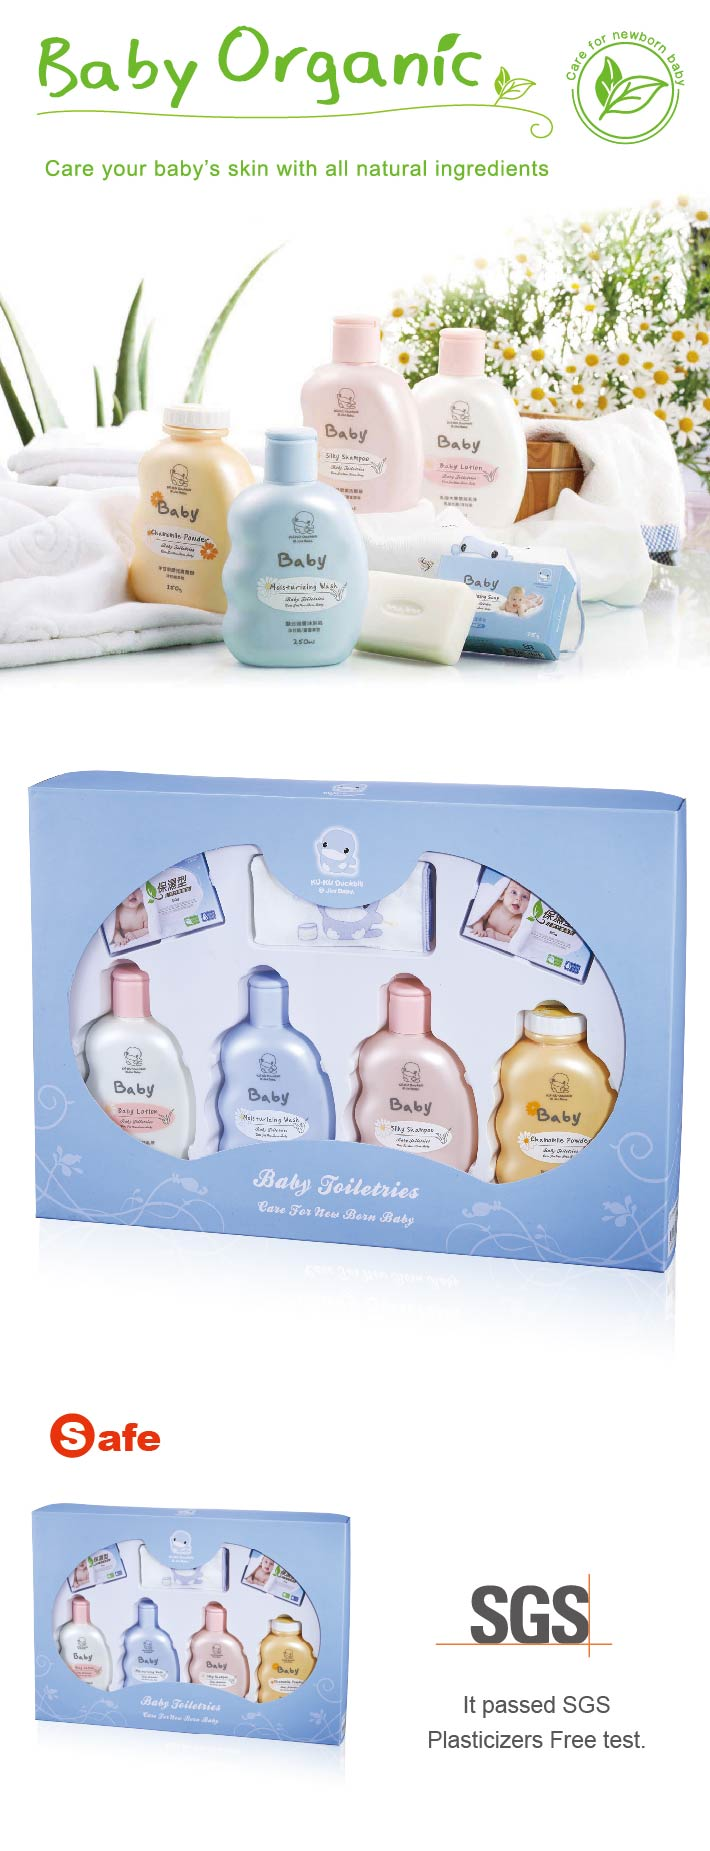 proimages/Bathing&CleanSeries/Bathing/BabyOrganic/1062/KU1062有機嬰兒沐浴禮盒英文.jpg